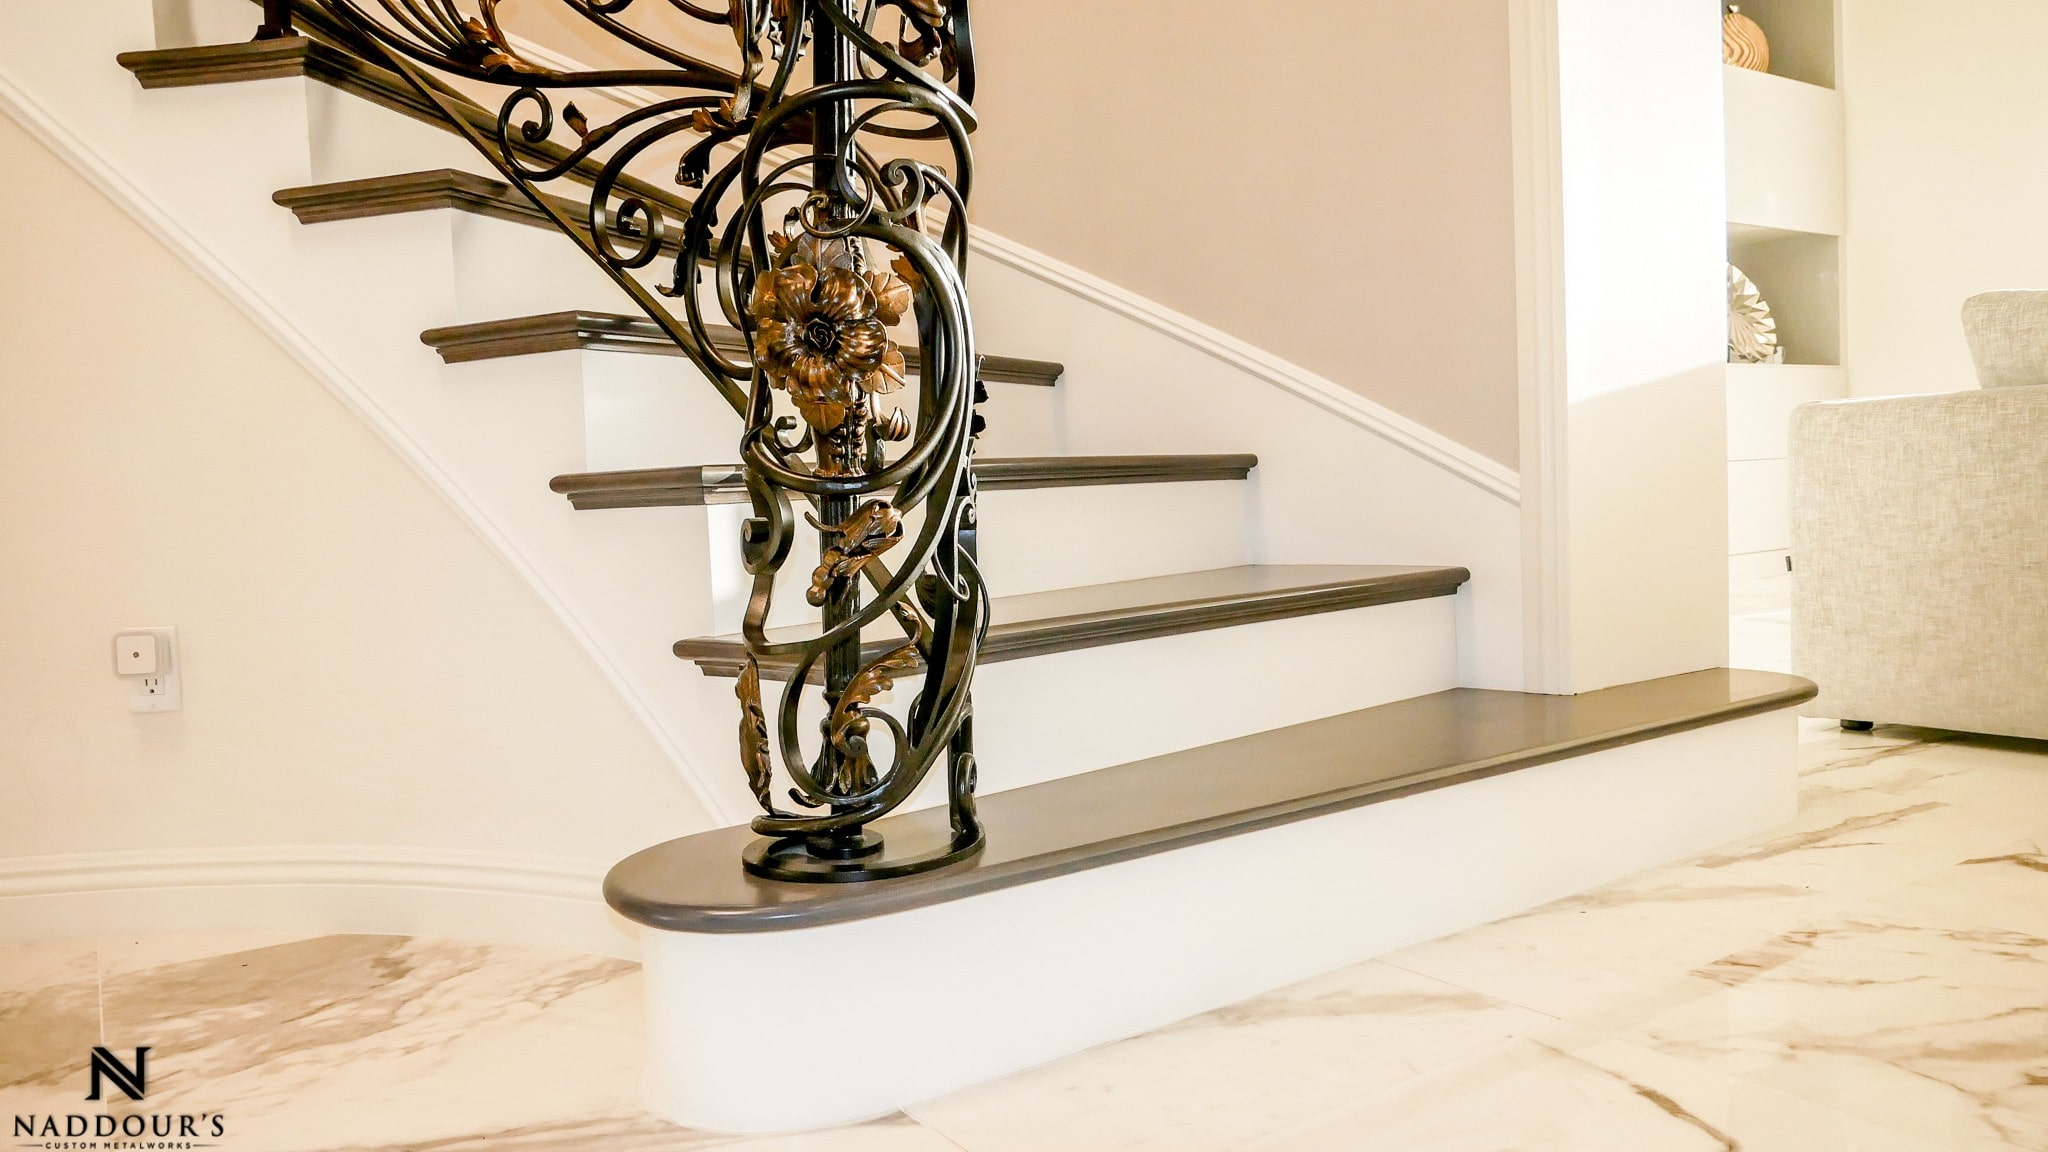 Naddour's Custom Metalworks Custom Staircase Railing Featured Project in Portola Hilla California .jpg 9.jpg